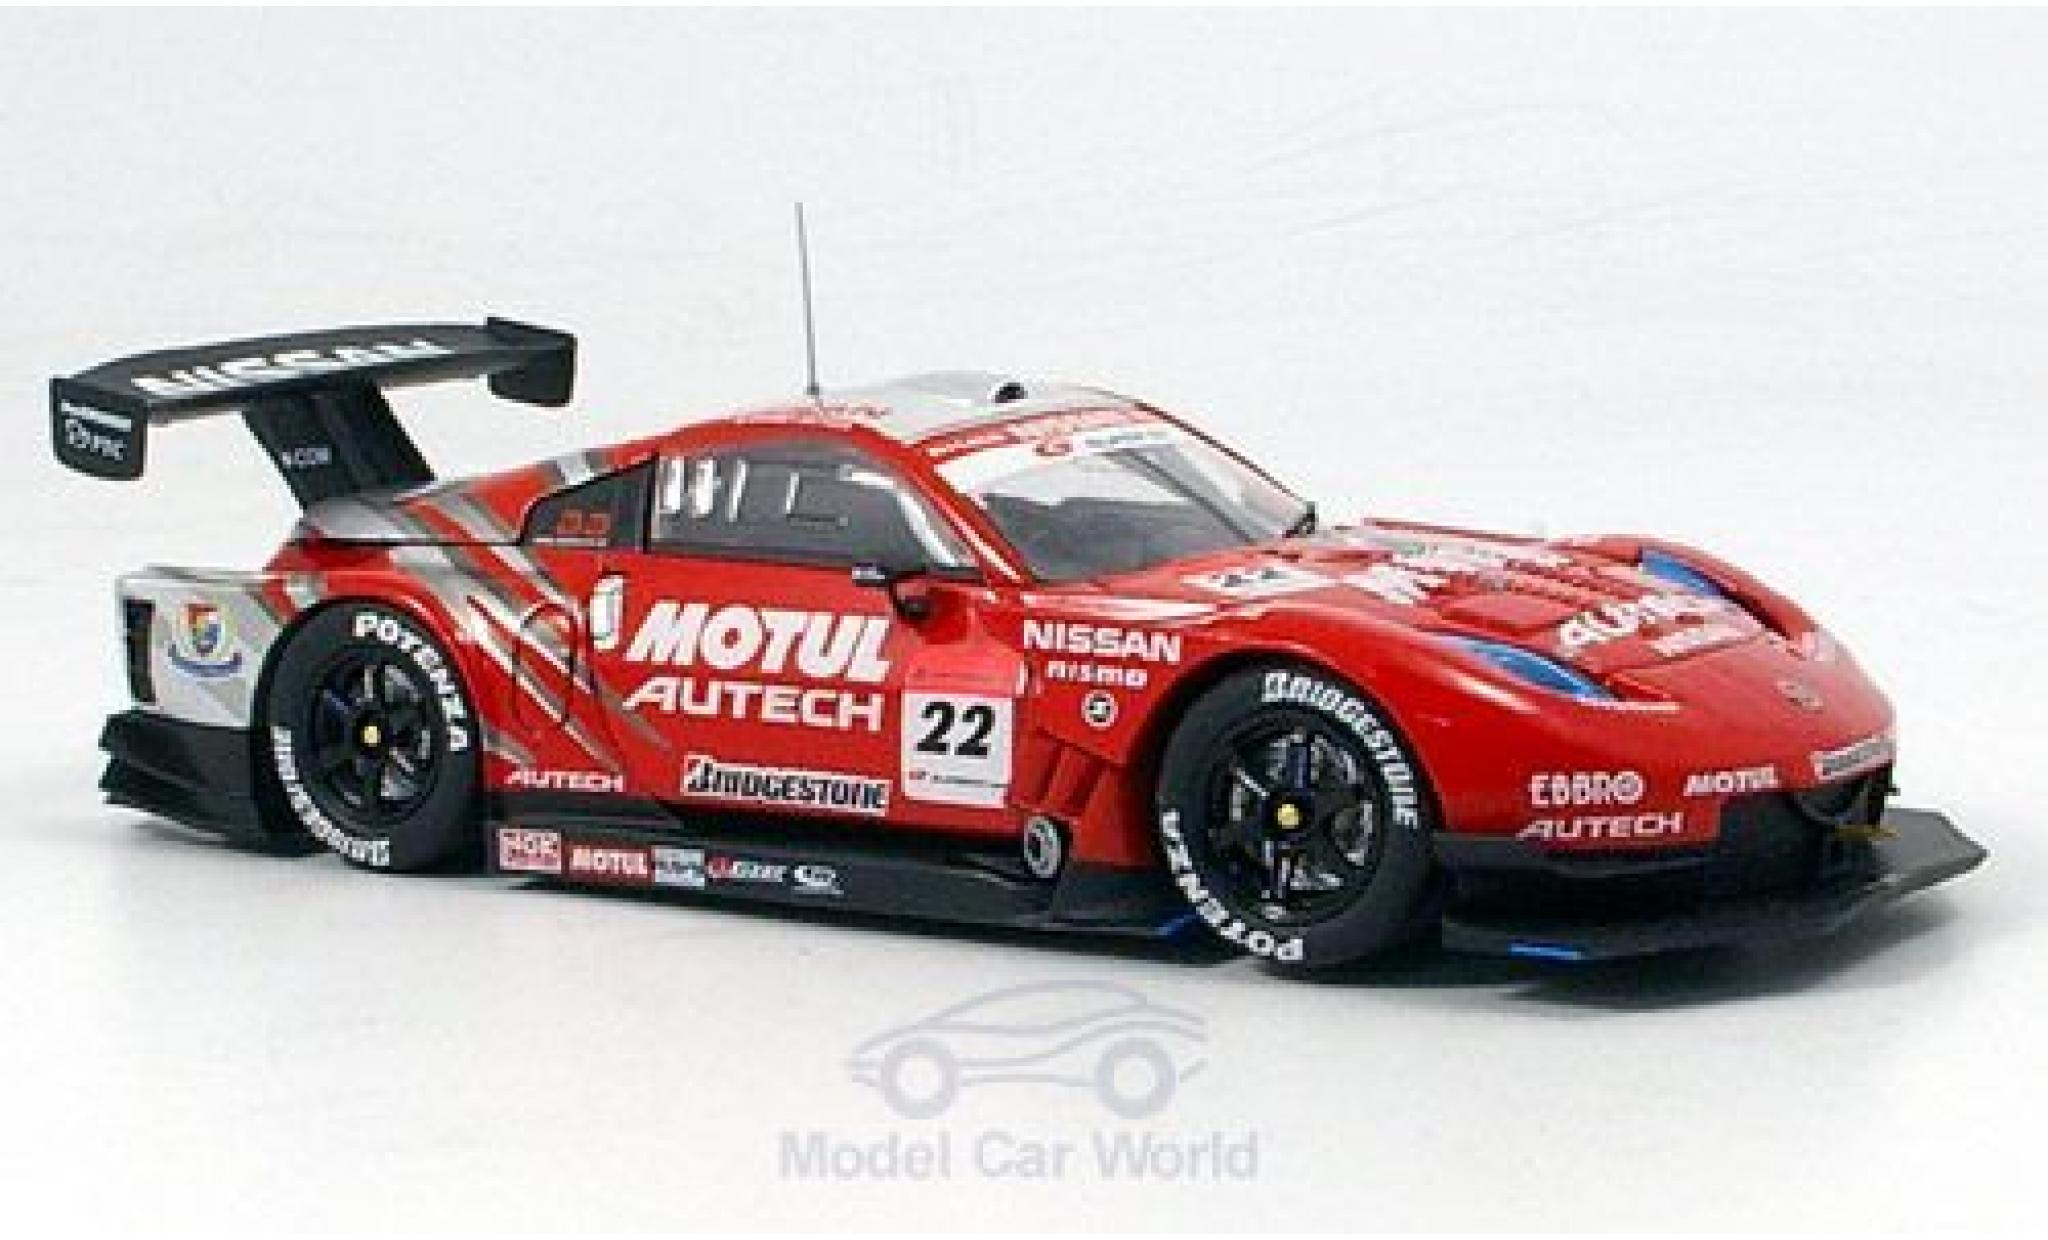 Nissan Fairlady Z 1/43 Ebbro Motul Super GT 2007